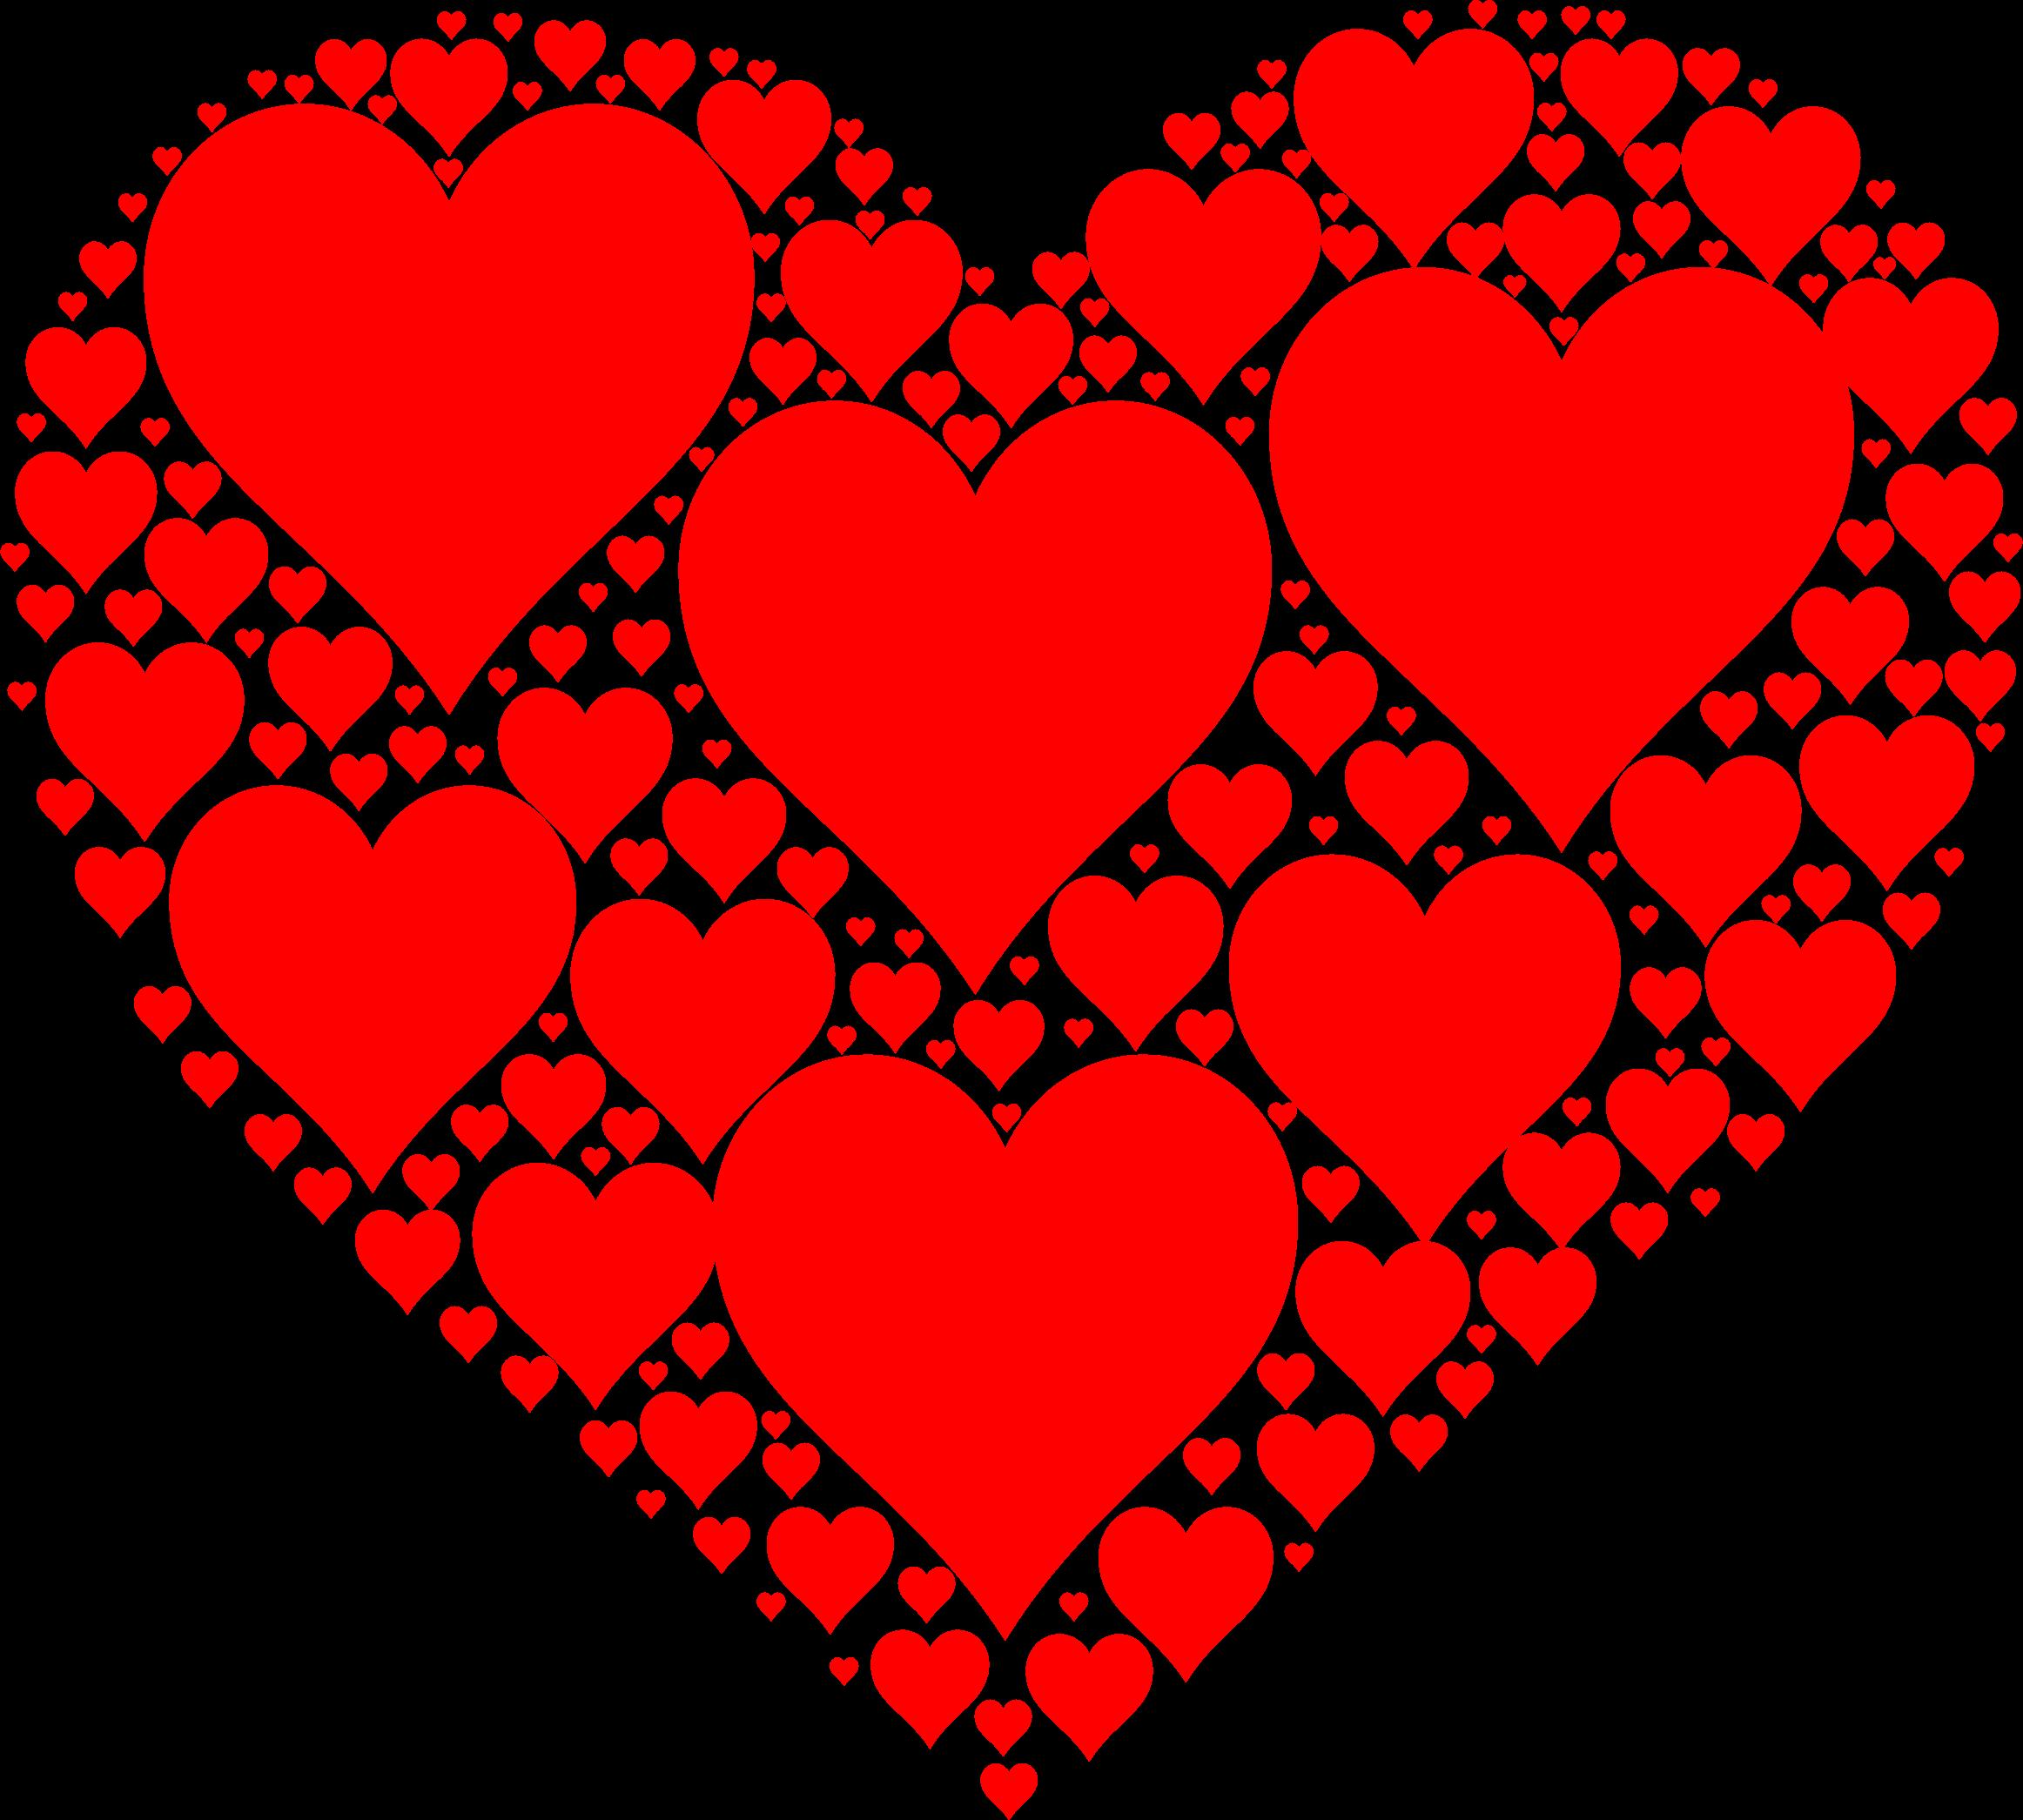 Heart in Heart Vector Files image - Free stock photo - Public Domain ...